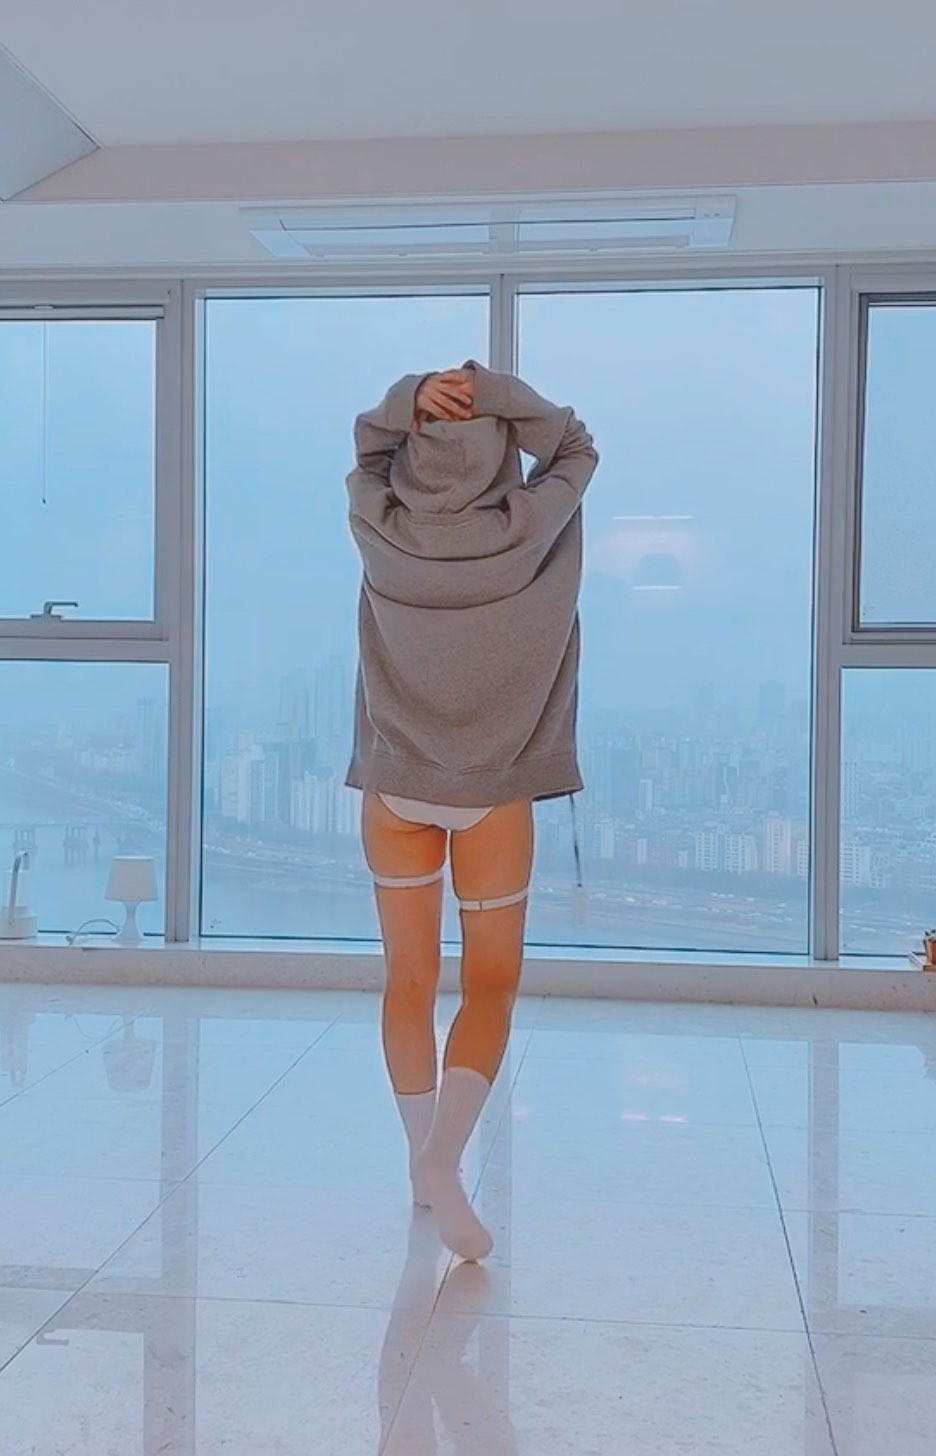 Sang A Yonini legs picture, shoe, attire ideas